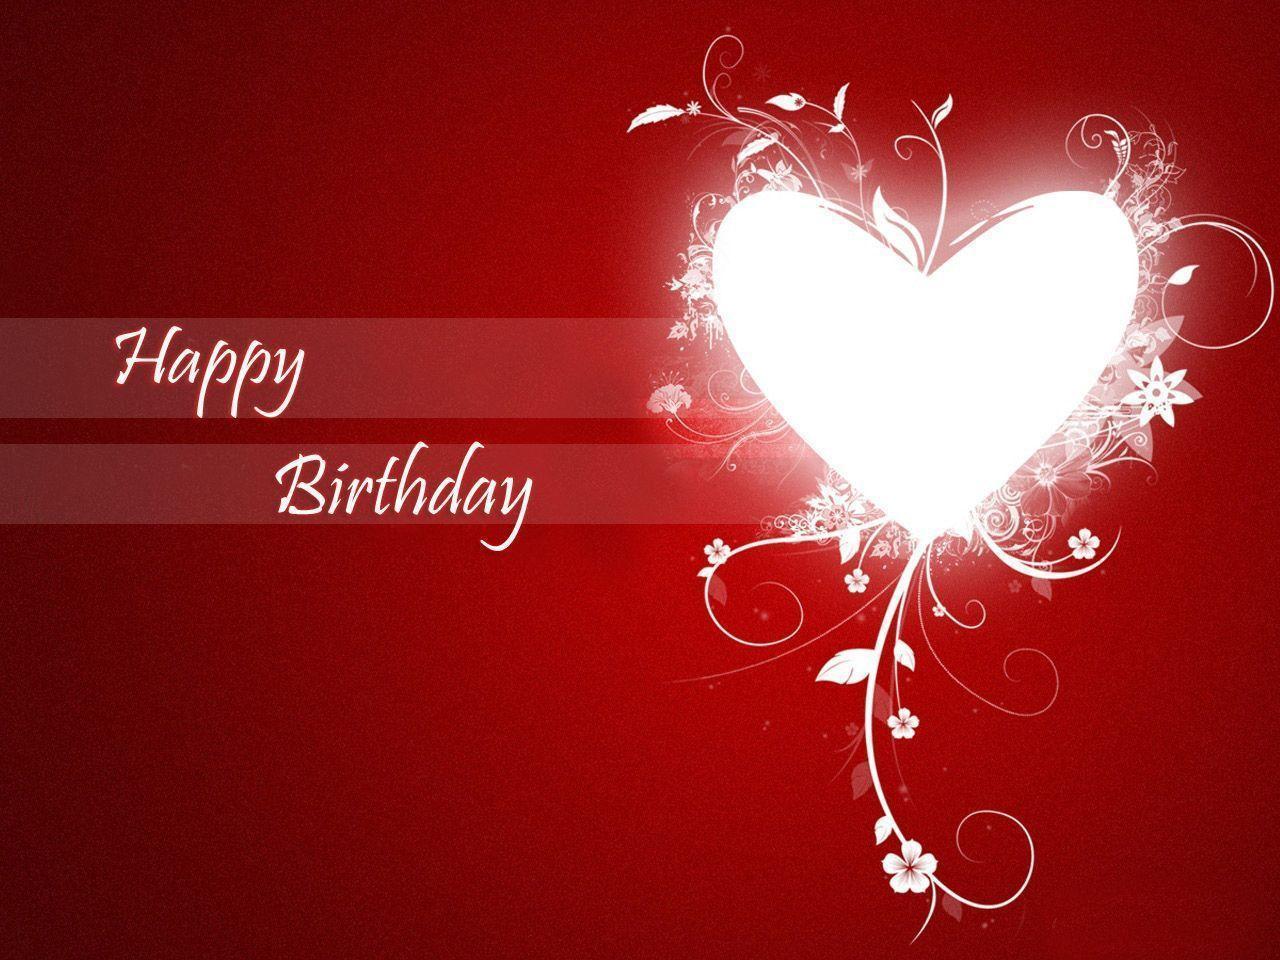 Happy Birthday Love Wallpapers